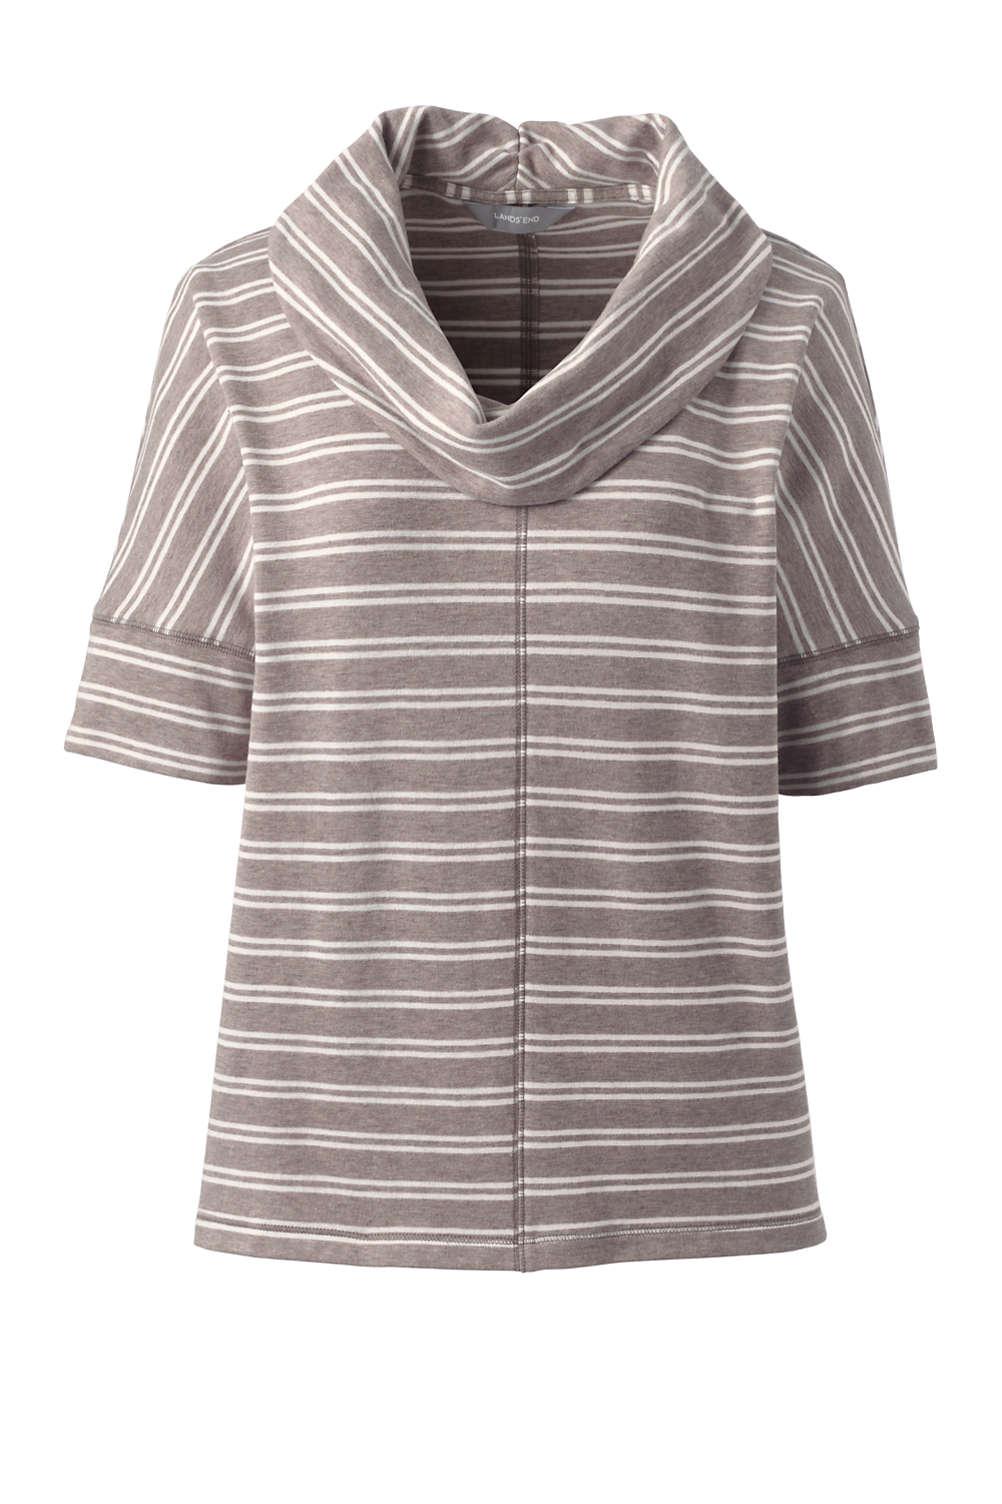 d6bdda5bfda Women s Plus Size Stripe Dolman Sleeve Cowl Neck Top from Lands  End